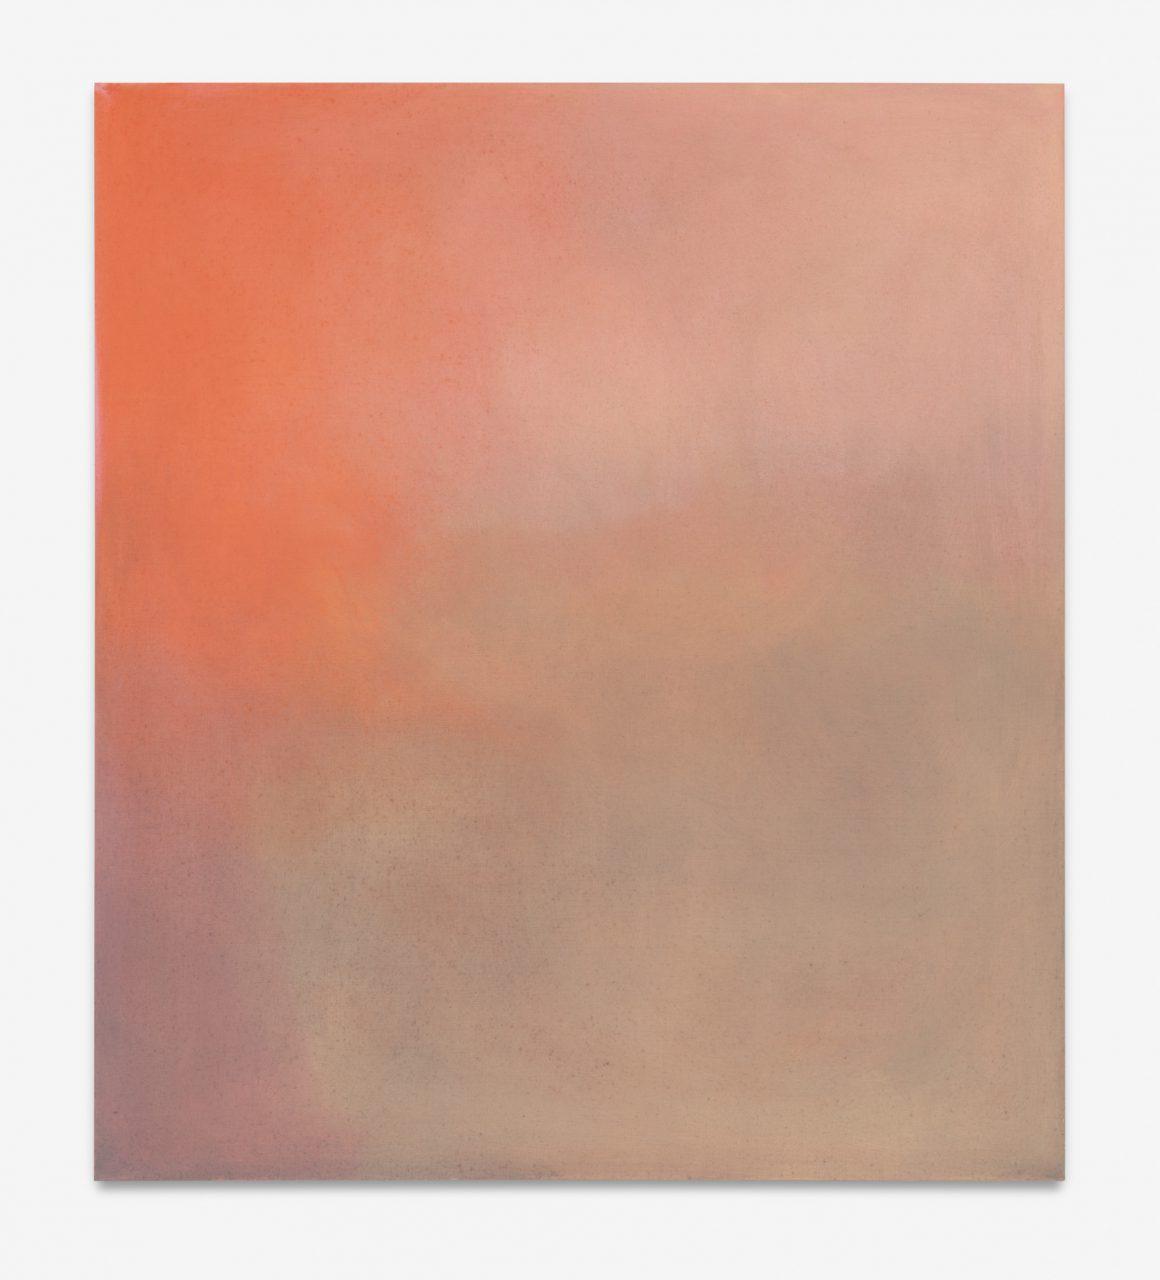 Prehistoric Sunset MII 2109 180x160cm oil on canvas